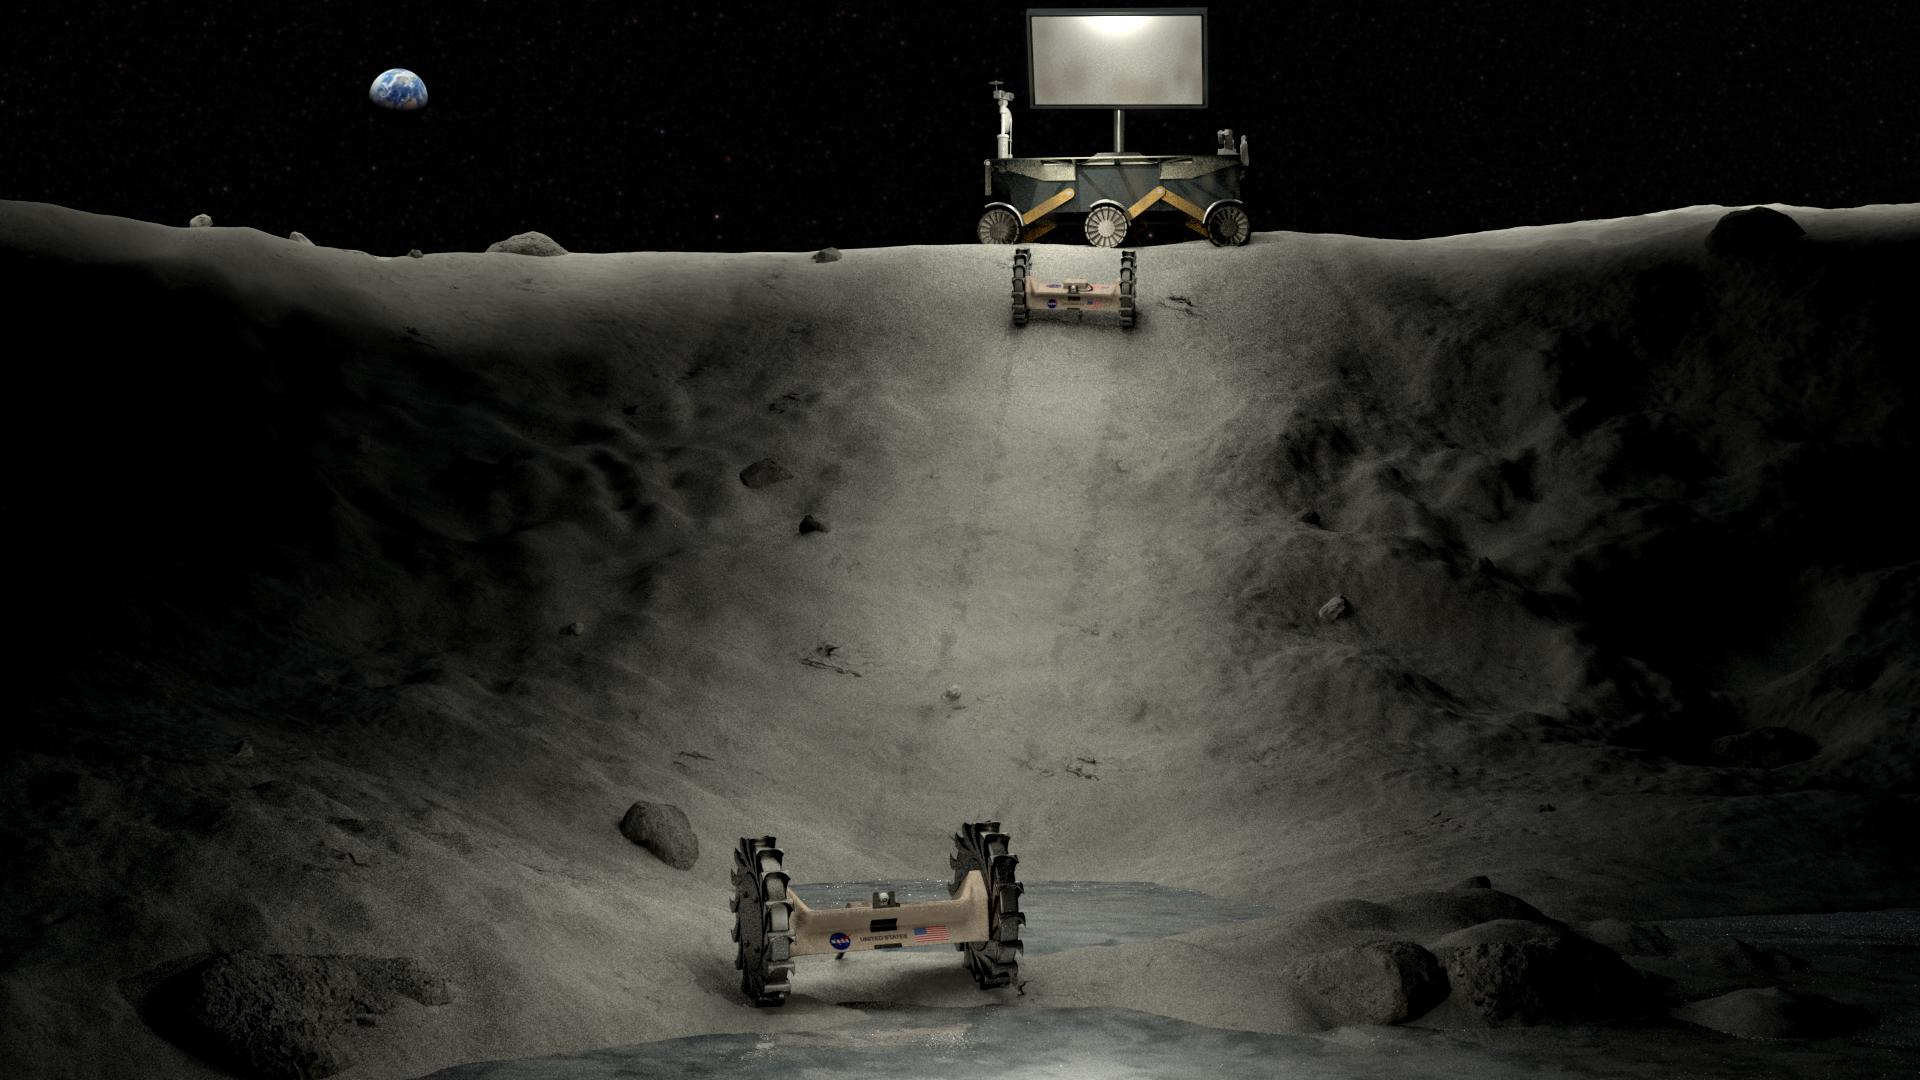 NASA Selects University Teams to Build Tech for the Moon